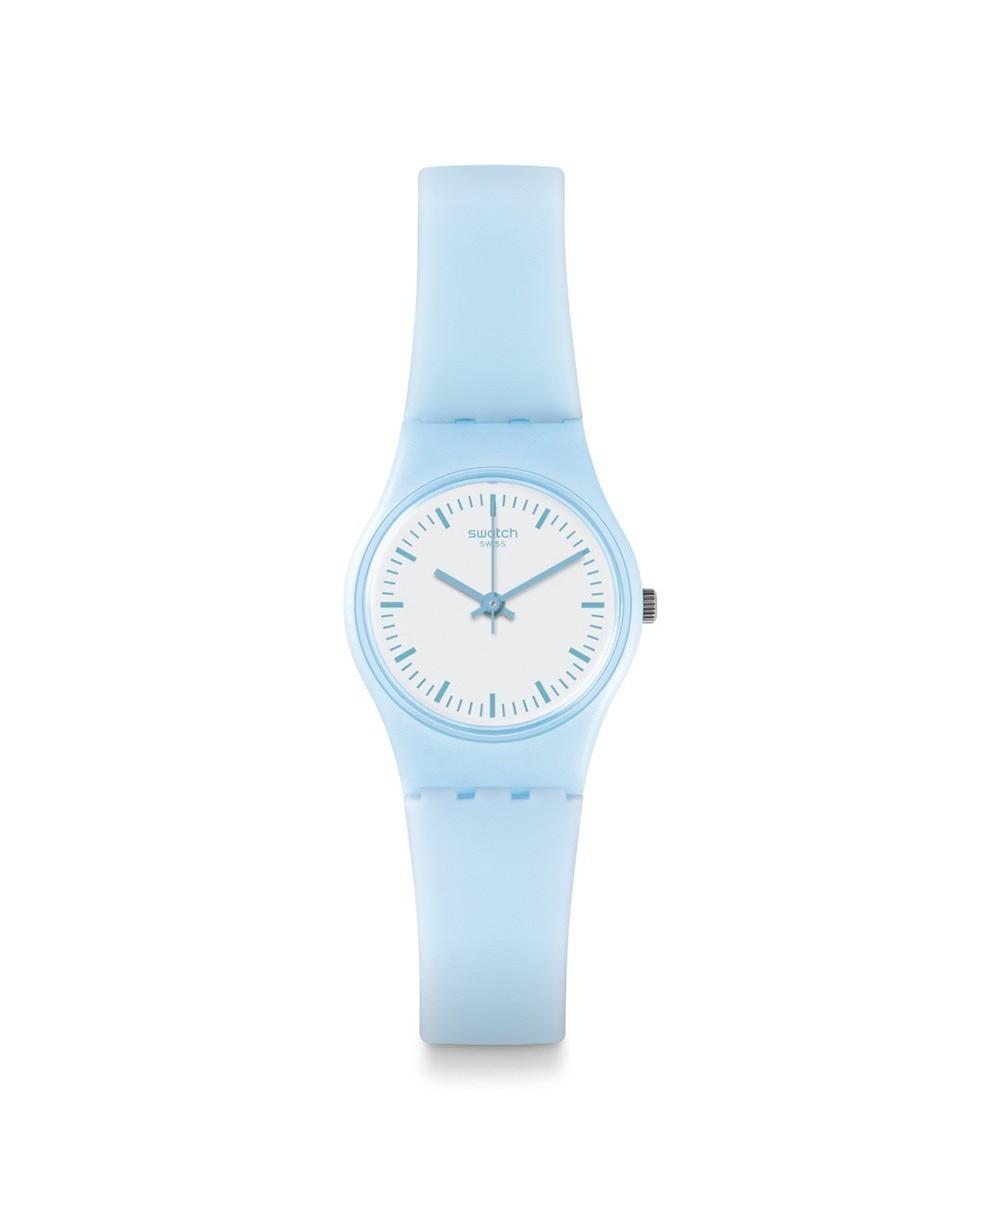 Reloj Swatch Clearsky LL119